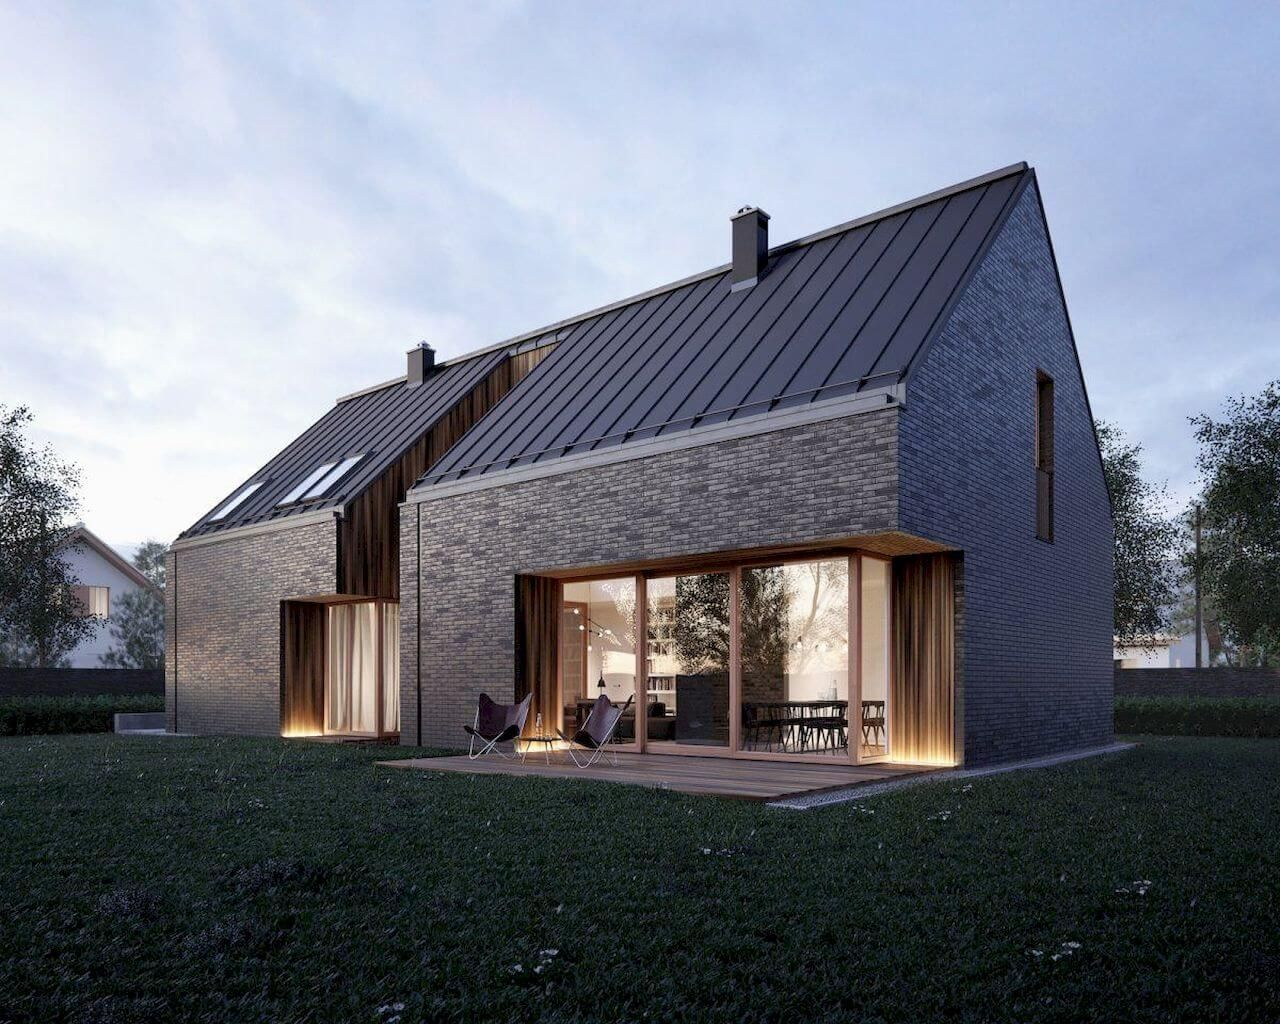 Best Of Scandinavian Exterior Designs Of The House Modern Brick House Modern Barn House Barn Style House